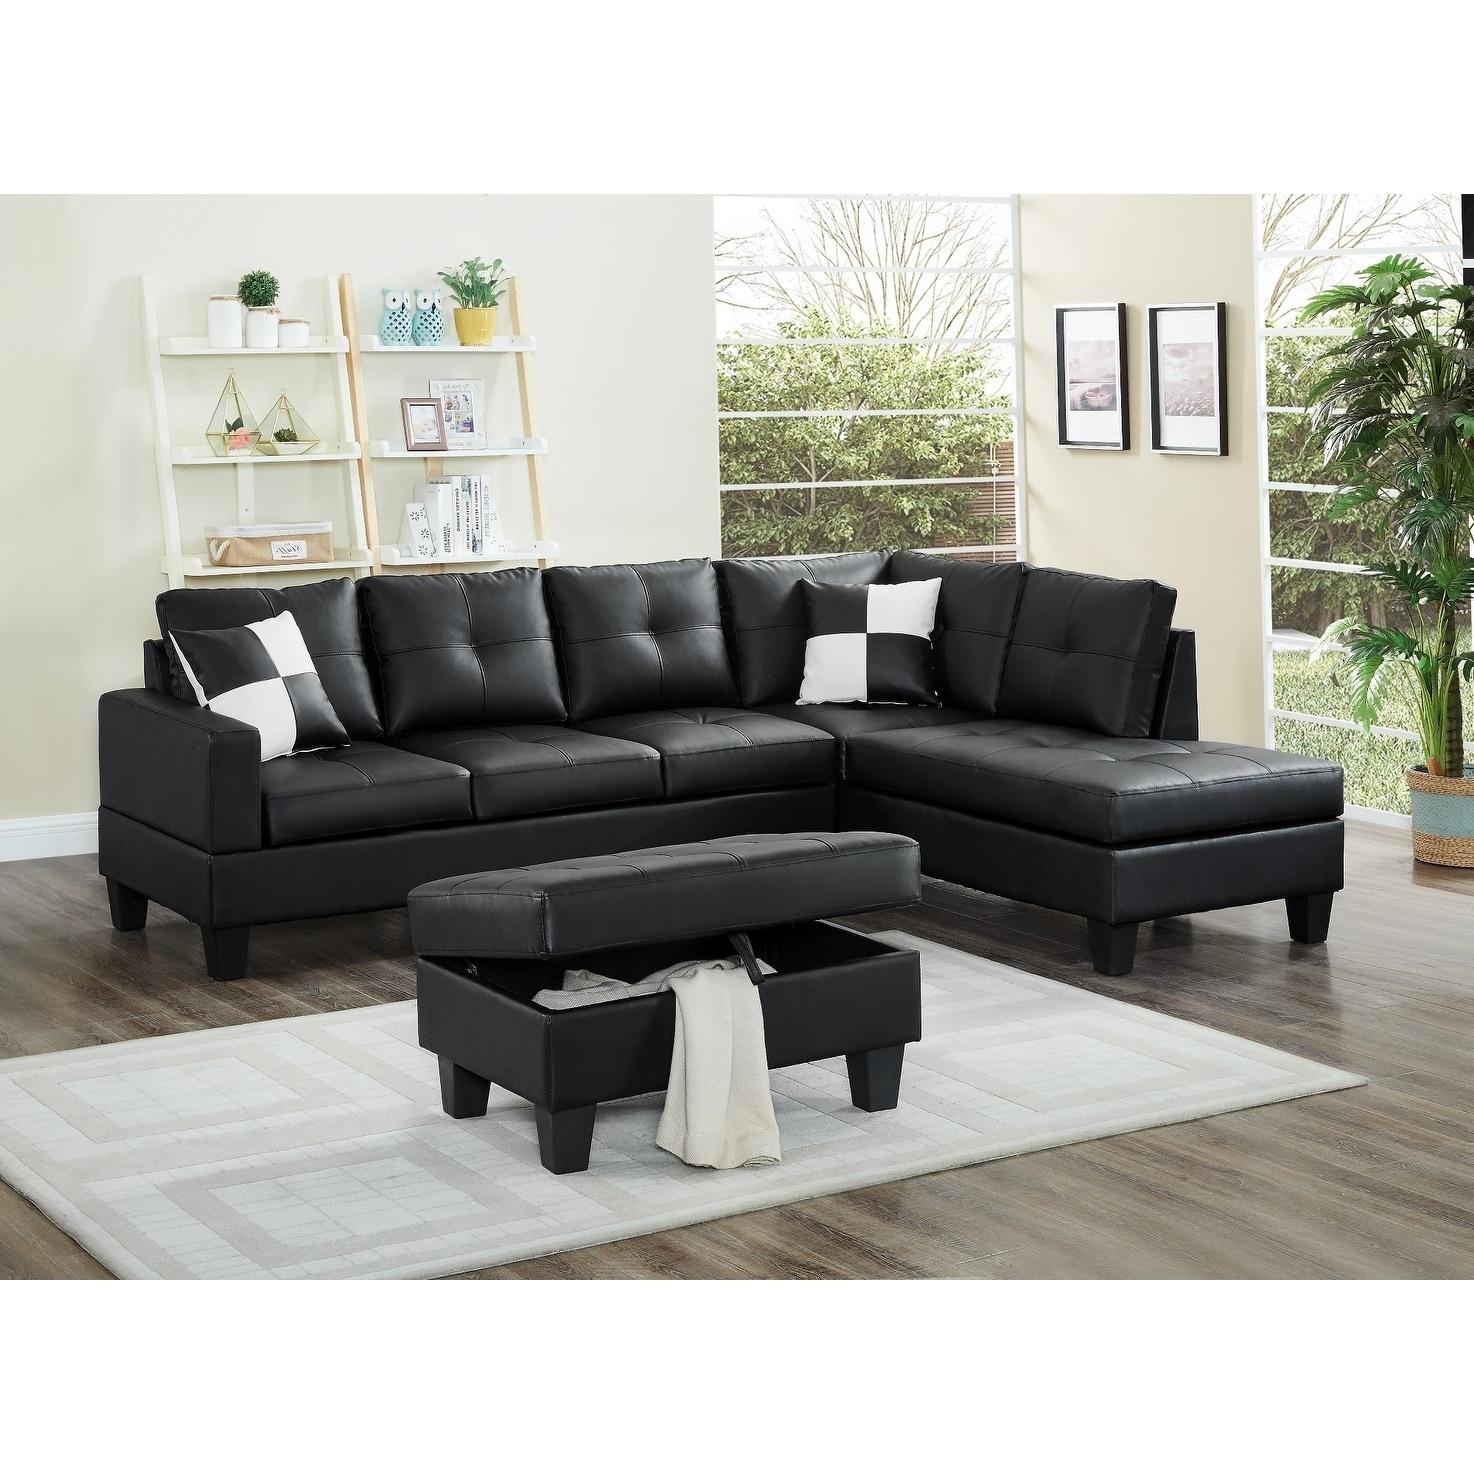 Marvelous 3 Piece Faux Leather Right Facing Sectional Sofa Set With Free Storage Ottoman Spiritservingveterans Wood Chair Design Ideas Spiritservingveteransorg